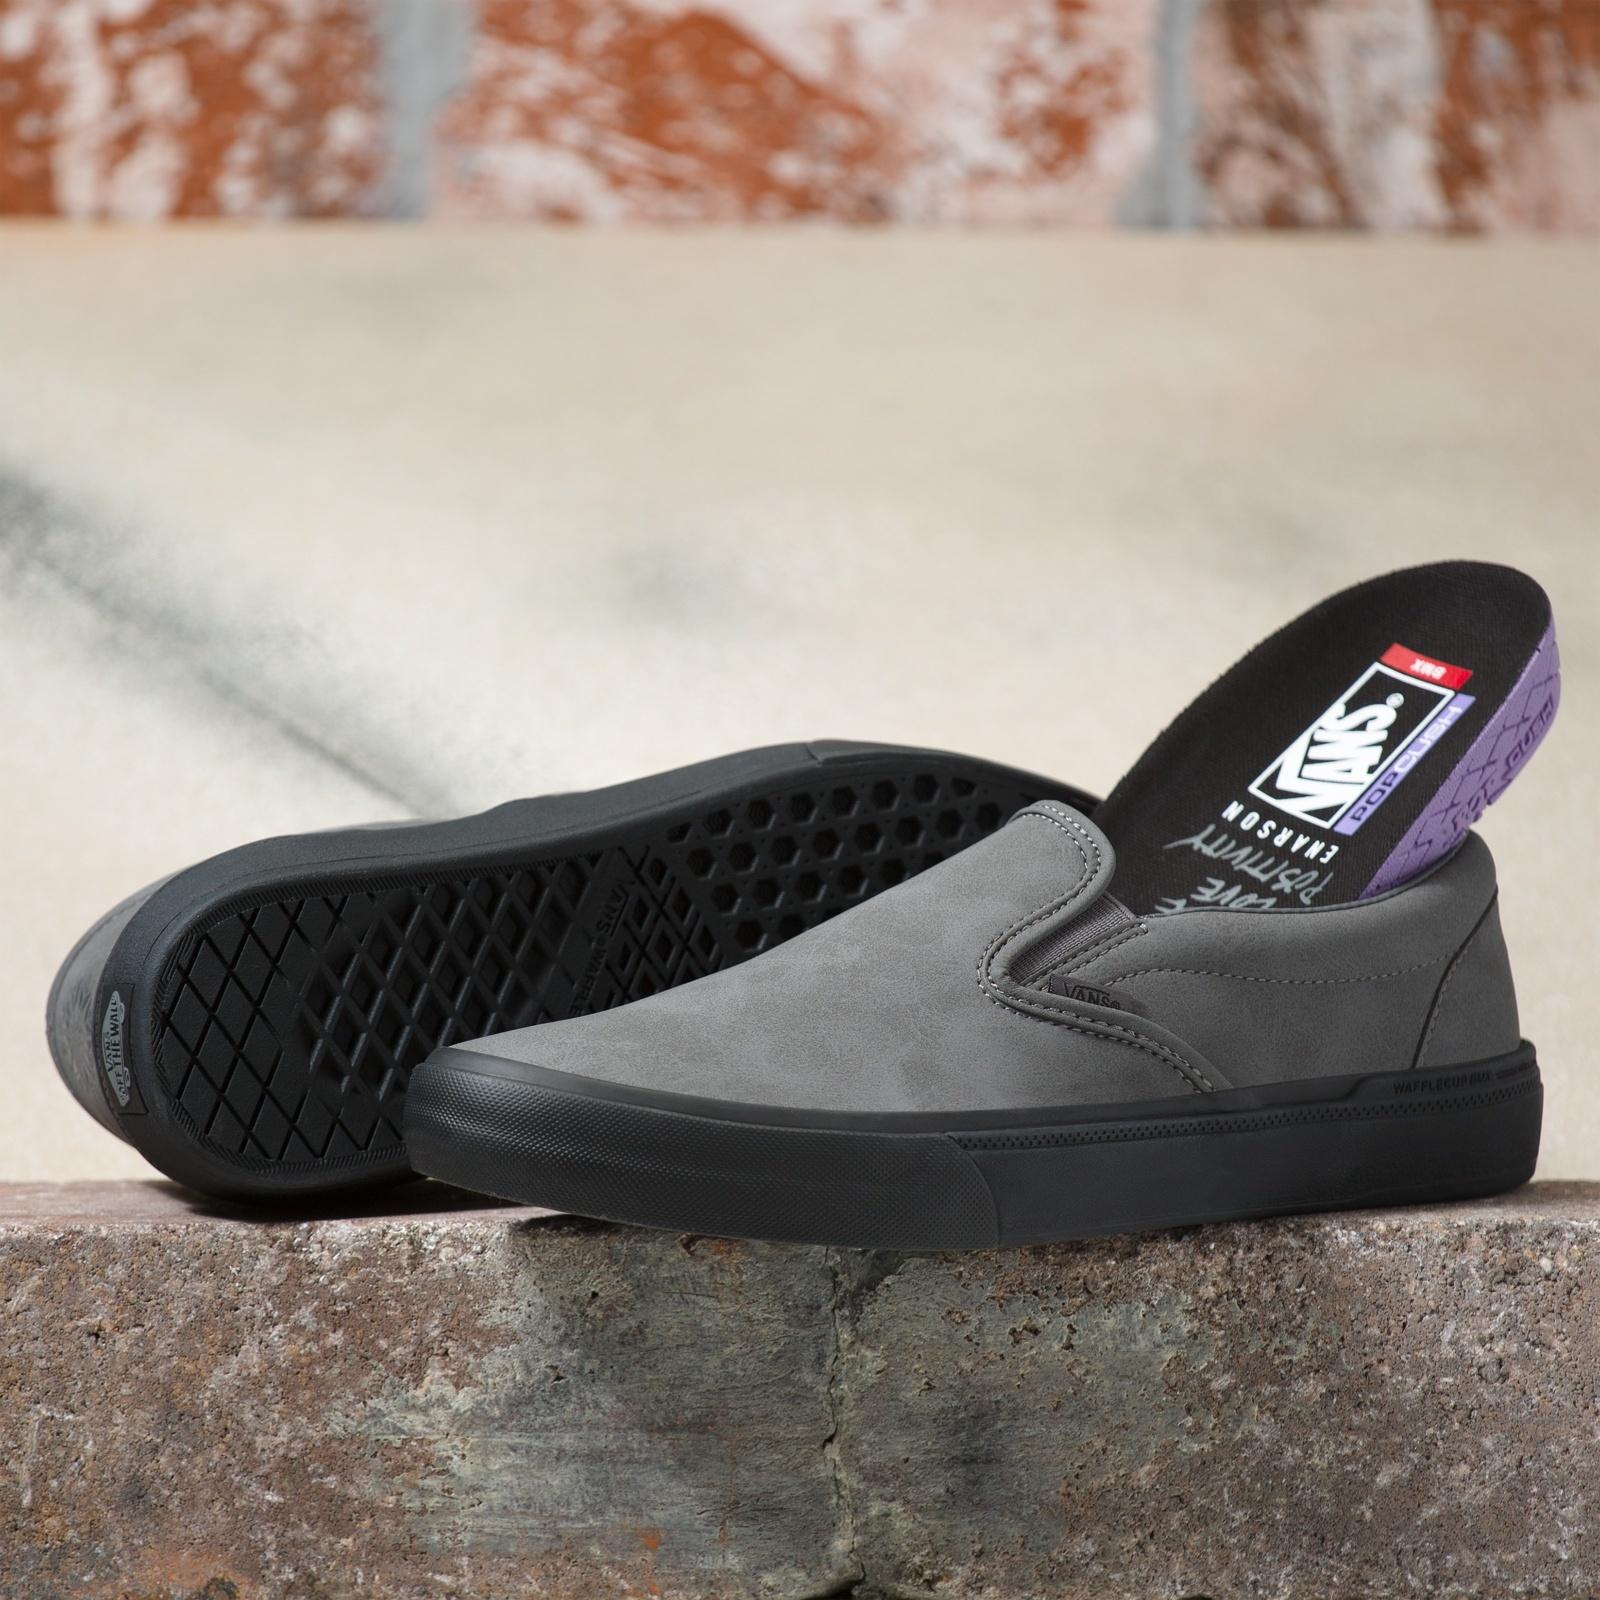 Vans BMX Slip On Shoe - (Dennis Enarson) Pewter/Black